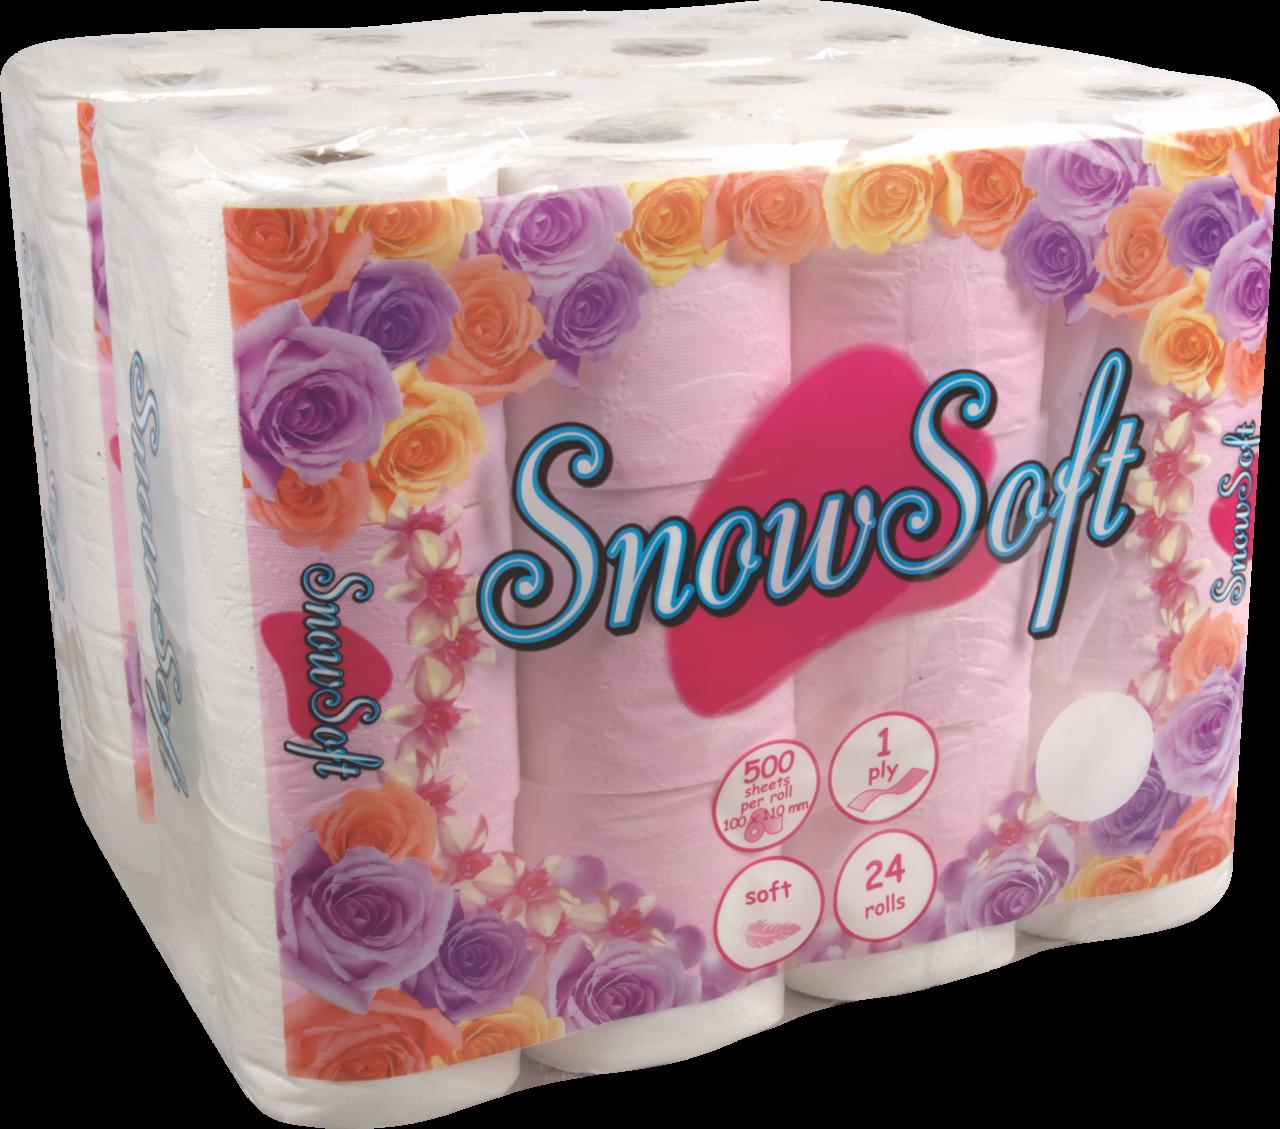 SNOWSOFT VIRGIN 1 PLY TOILET TISSUE